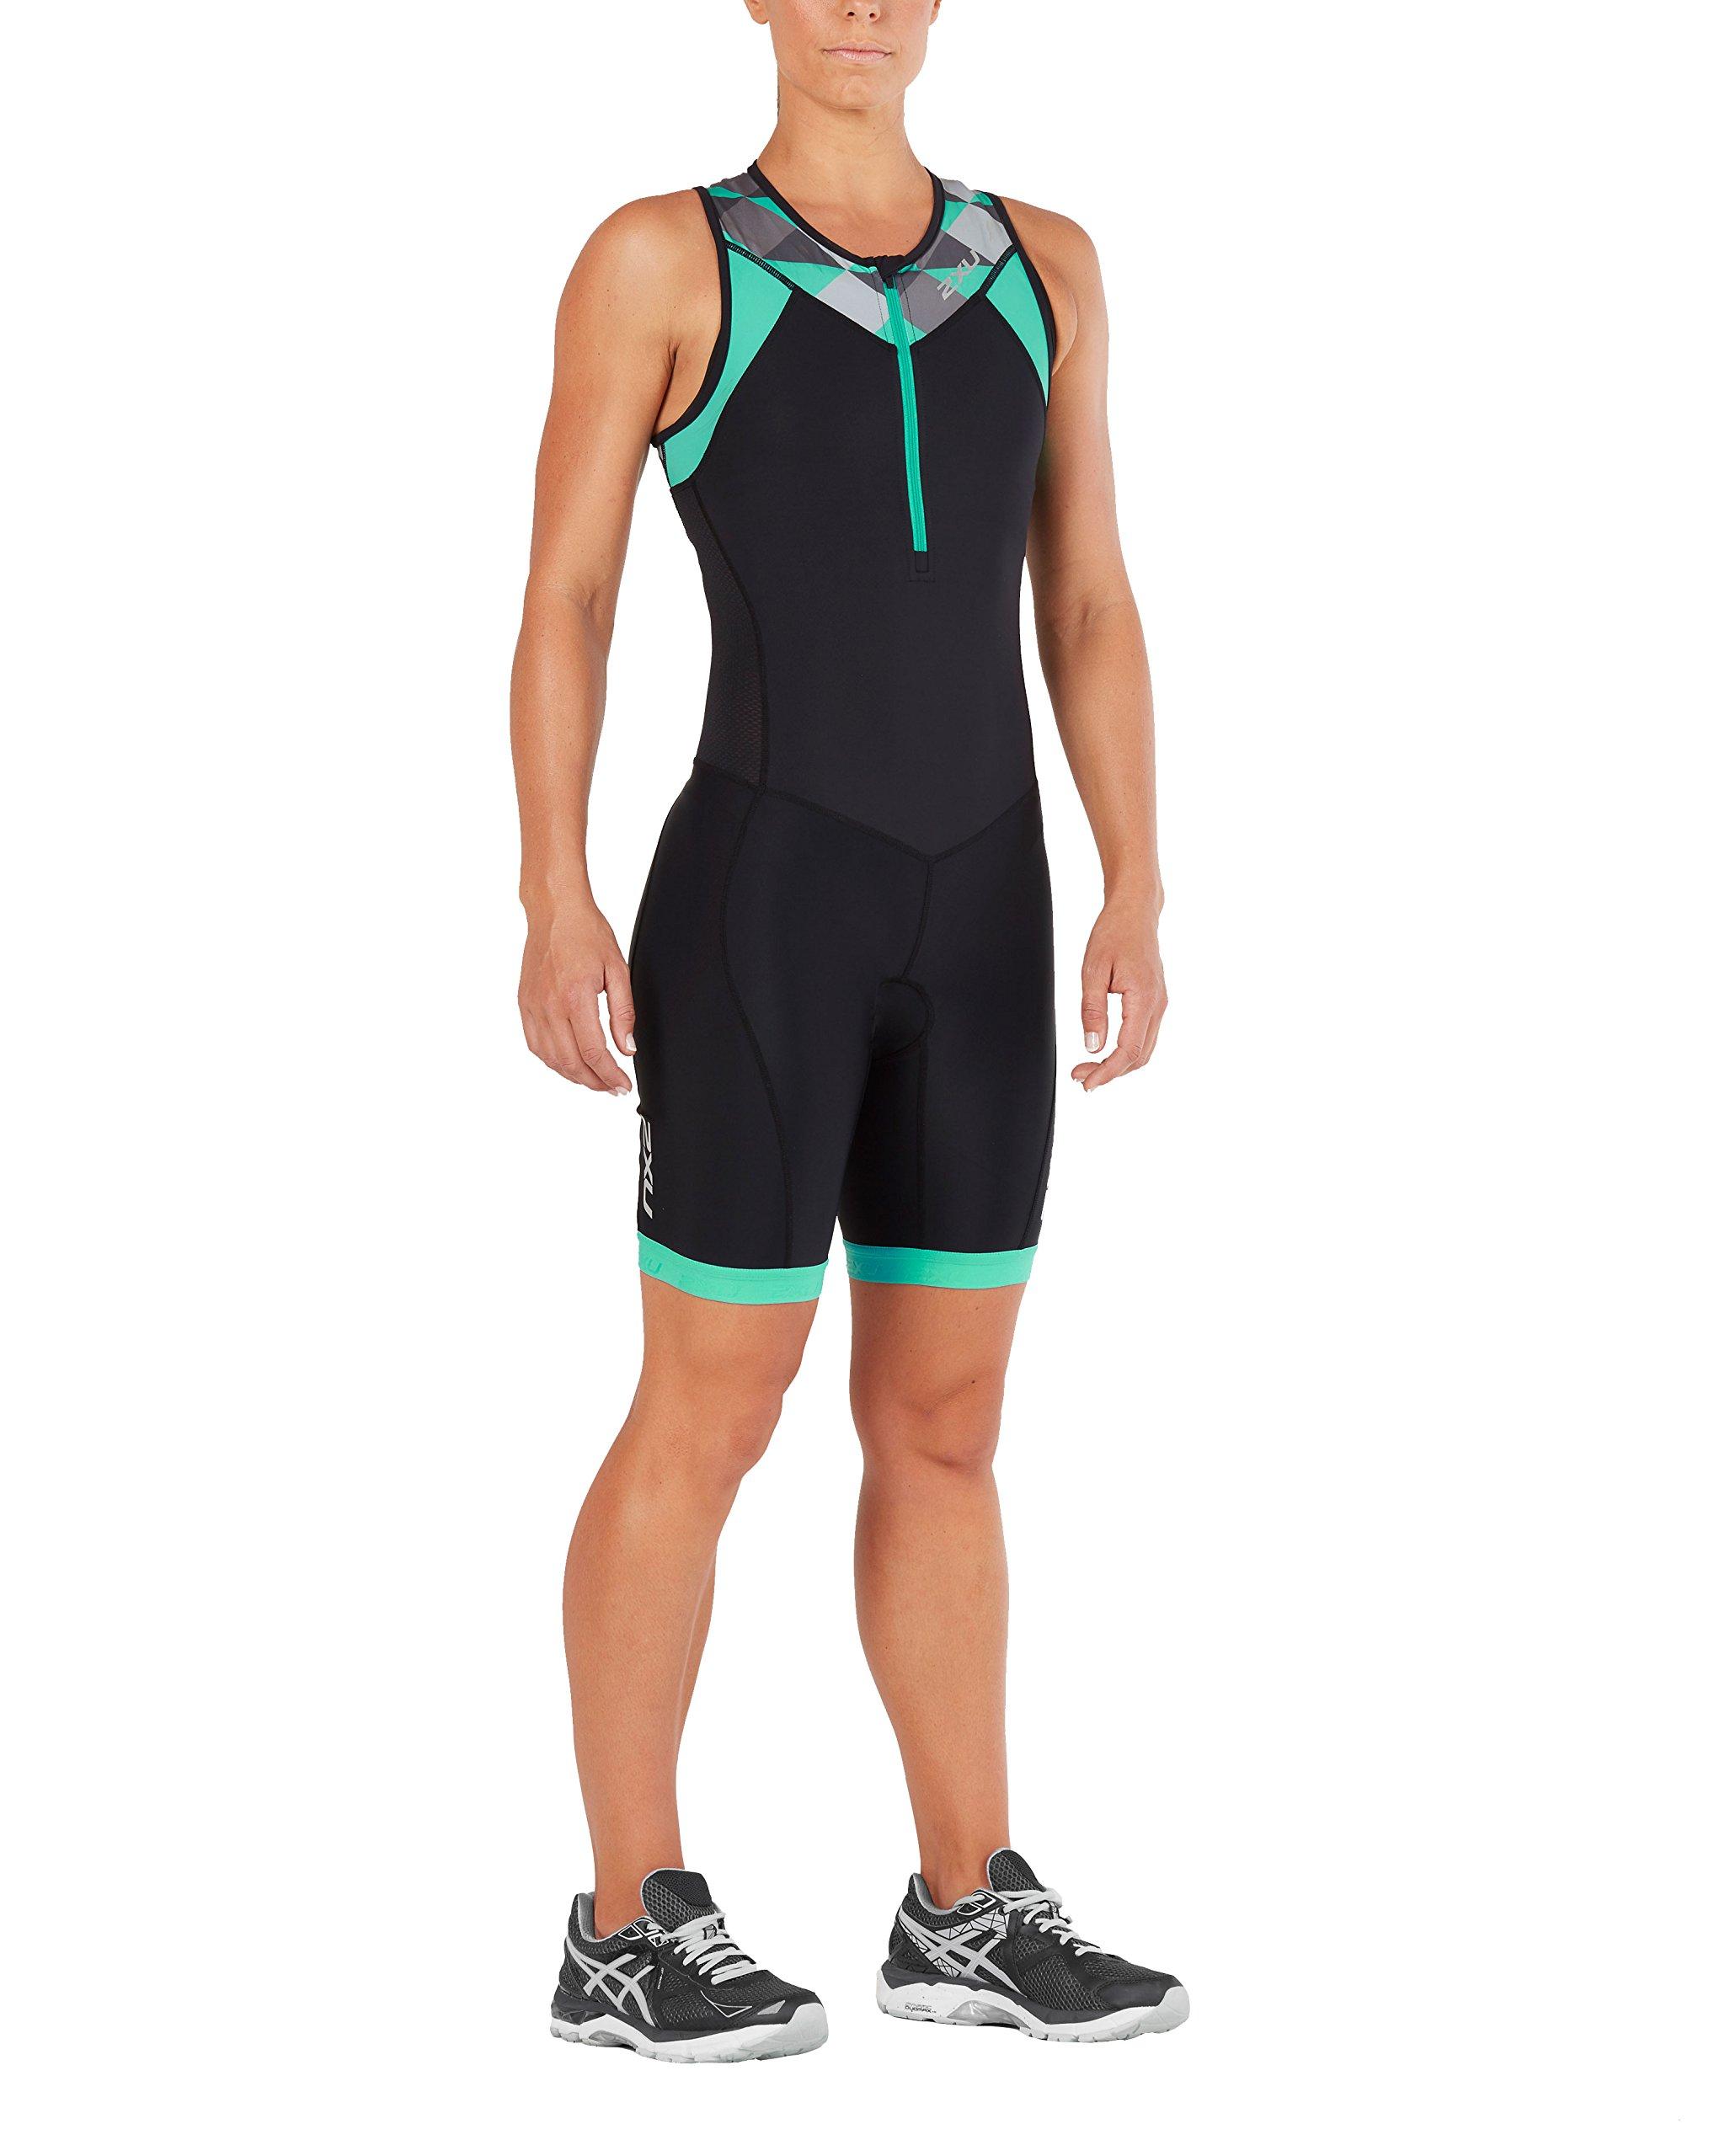 2XU Womens Active Trisuit, Black/Retro Tri Aqua Green, Large